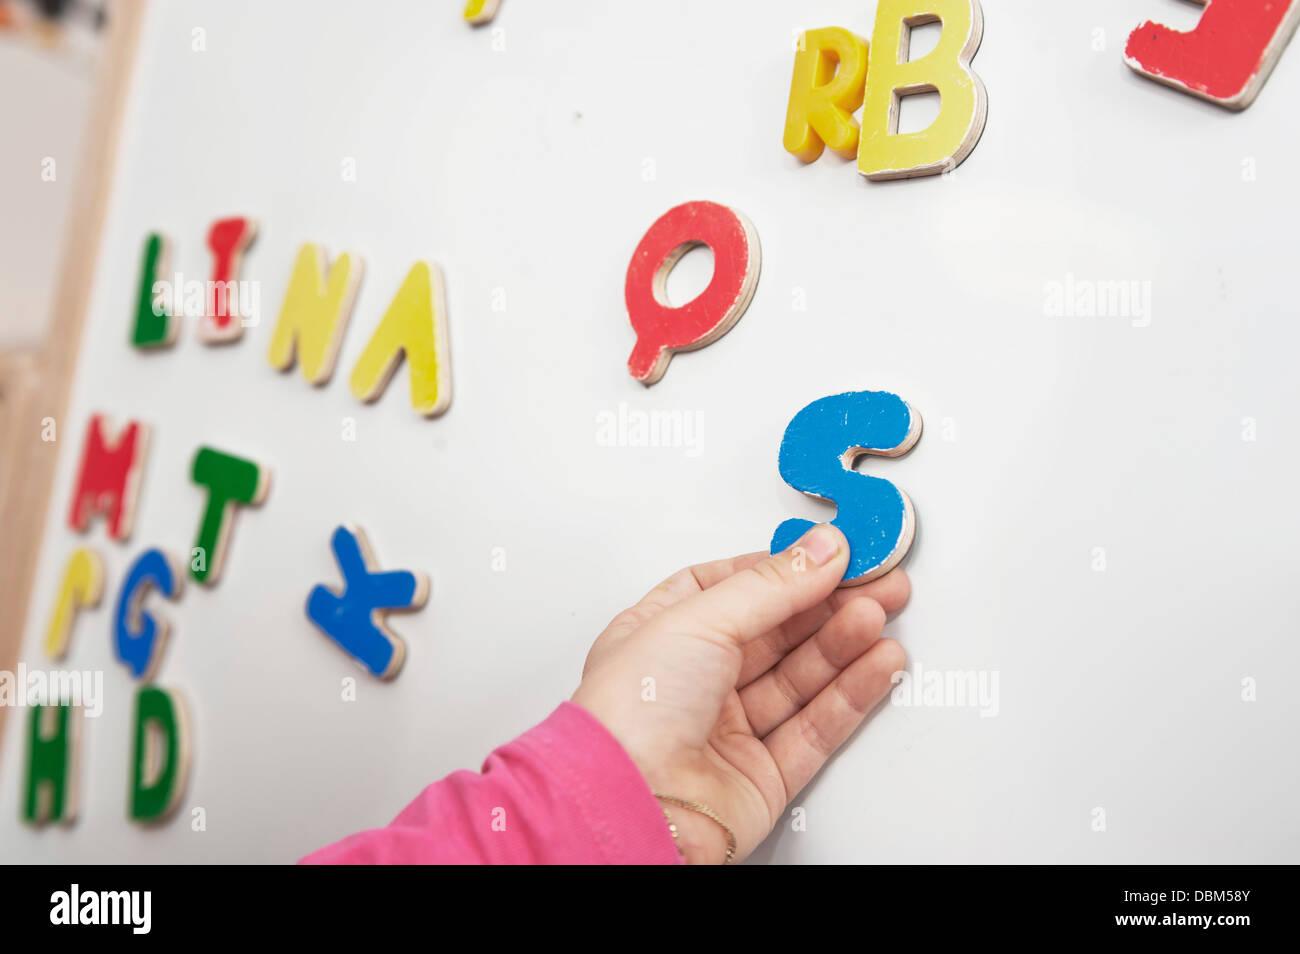 Capital Letters On Blackboard, Close-up, Kottgeisering, Bavaria, Germany, Europe - Stock Image